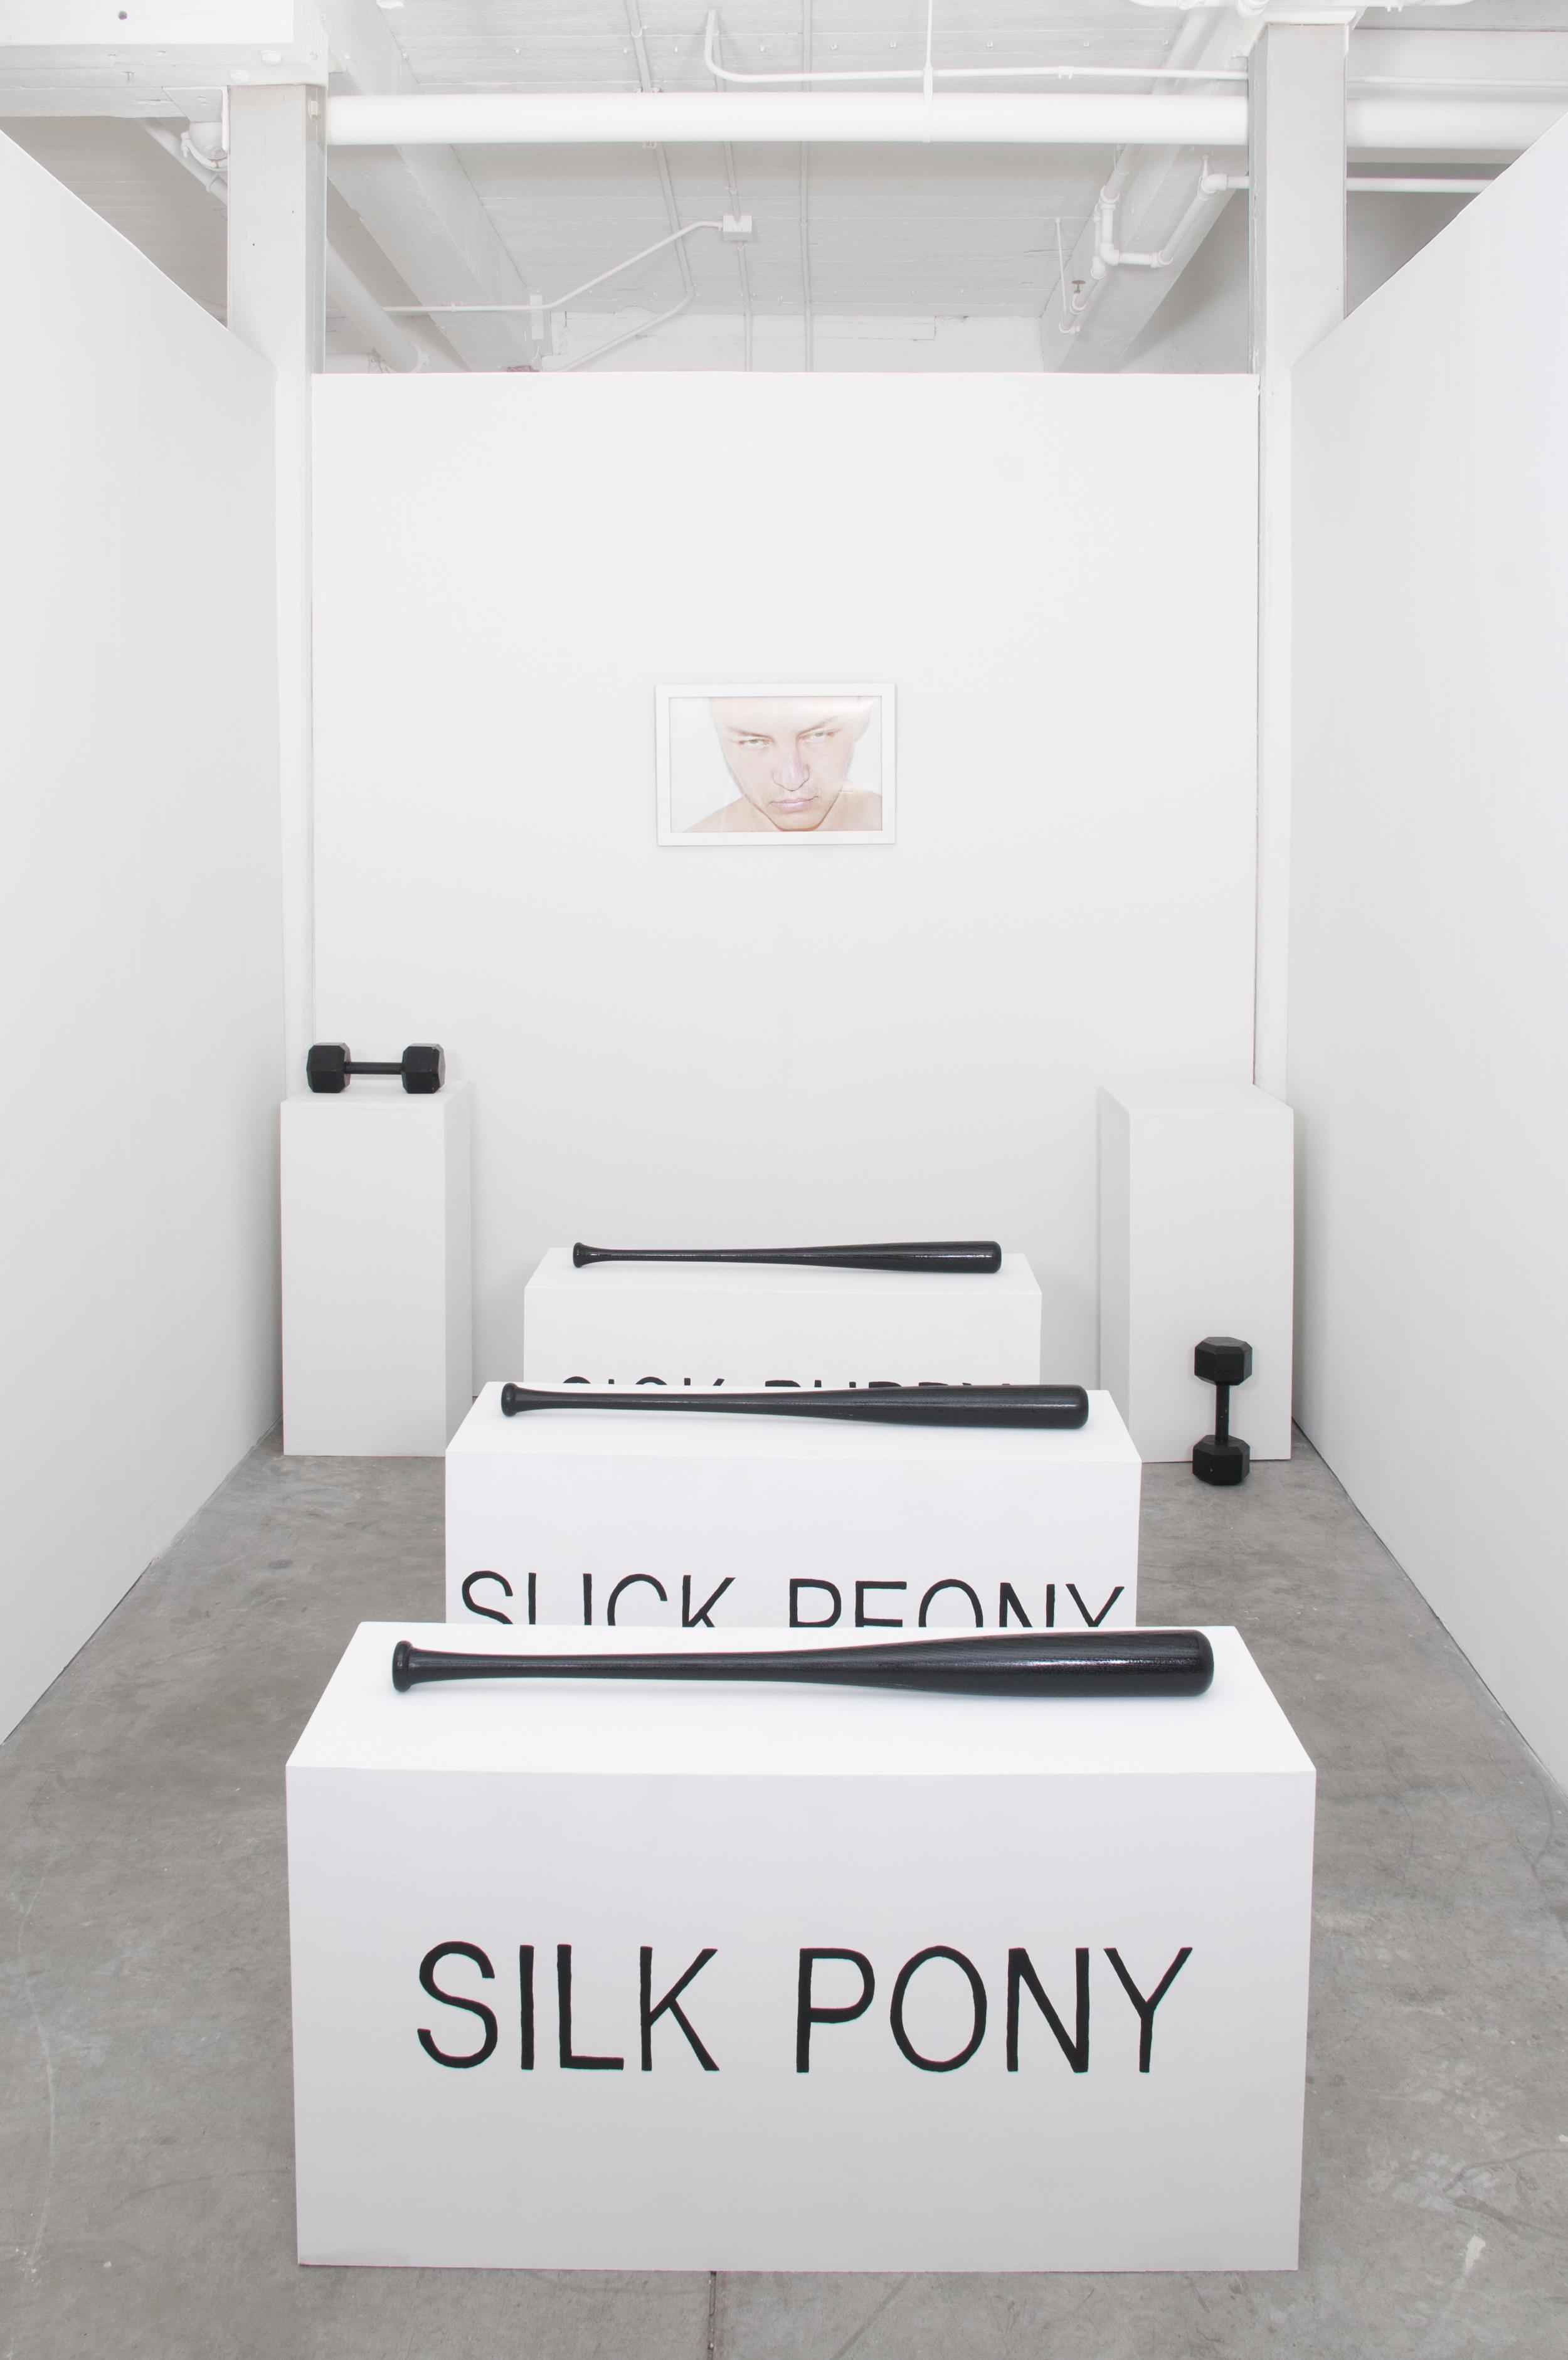 Pleasure Seeker Installation (C Print in Artist Frame, 3 Sculptures, 2 Dumbbells) Dimensions Variable 2014